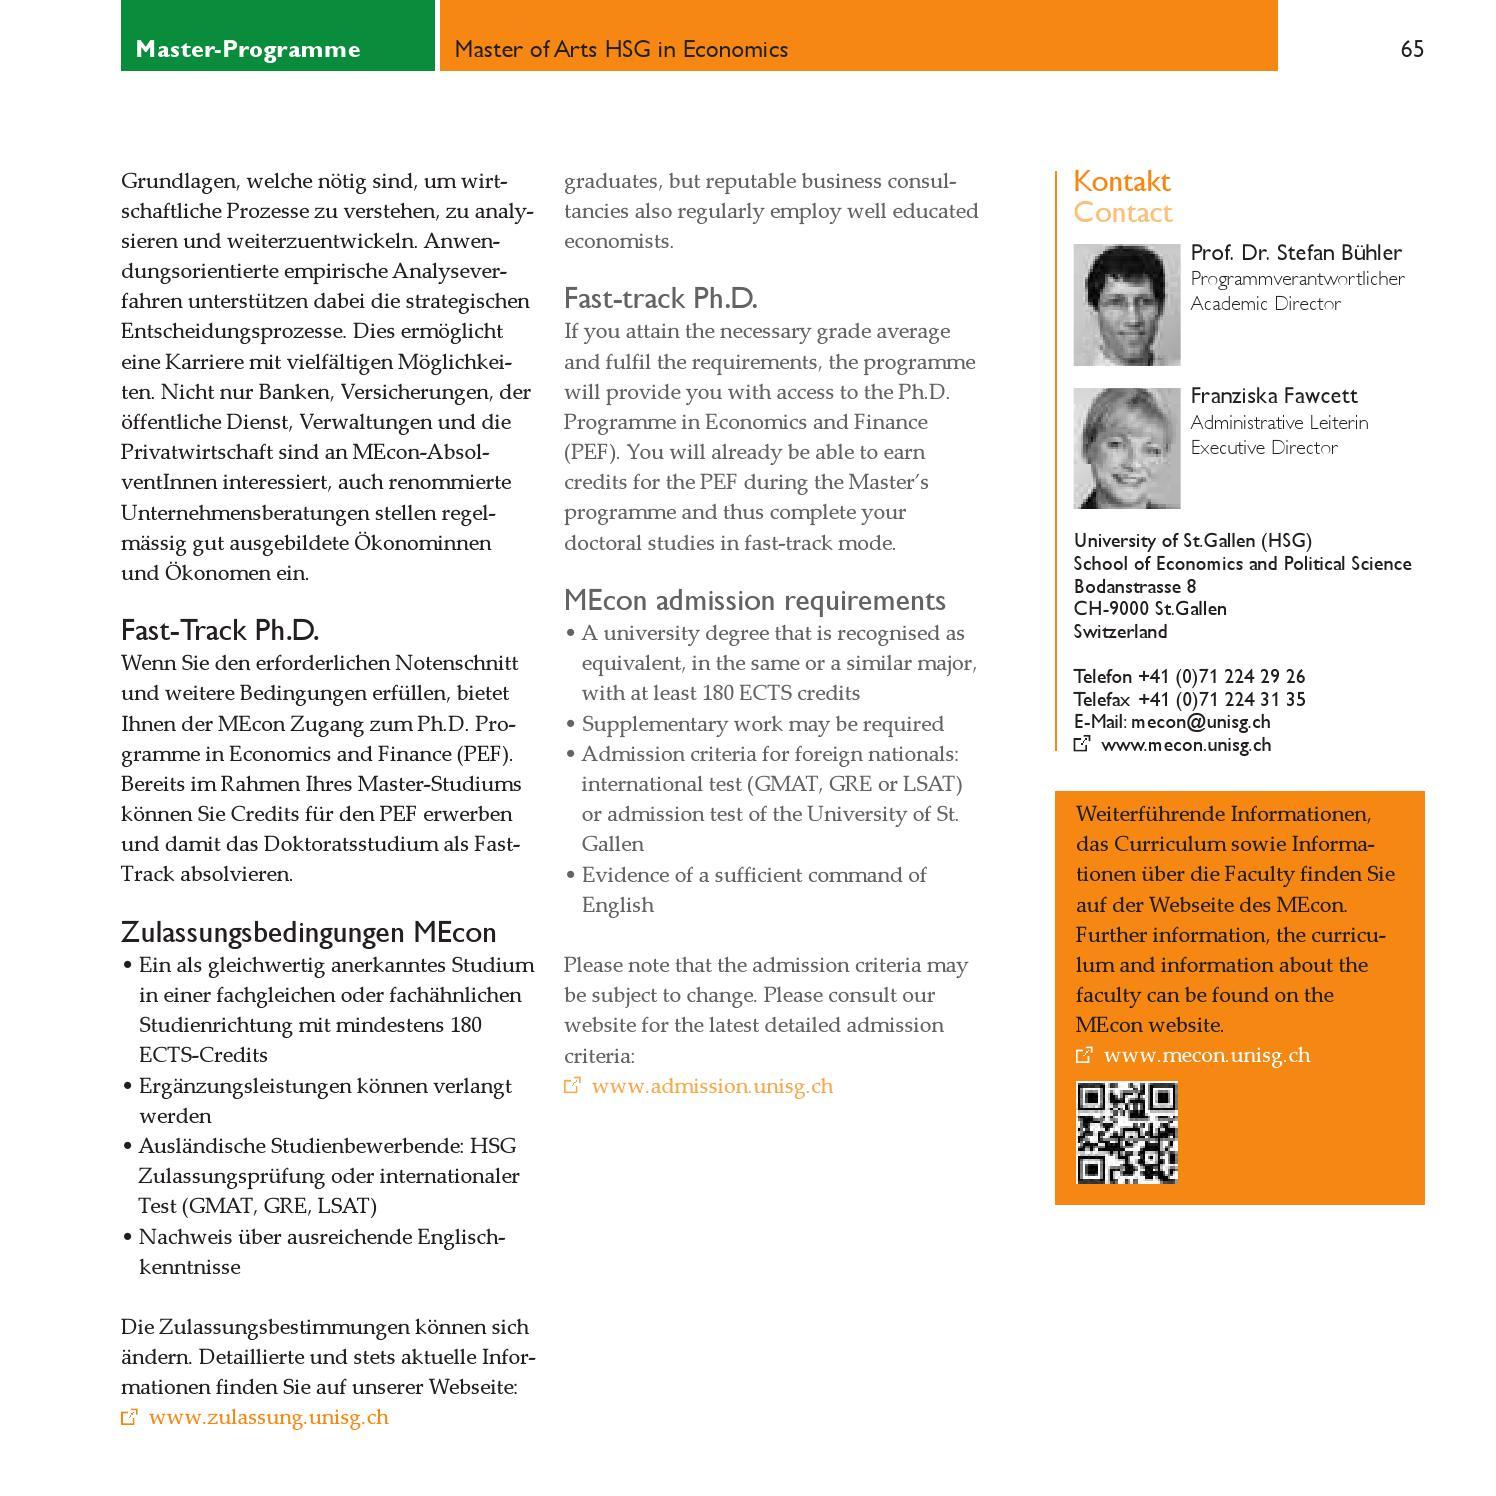 Master Programme / Graduate Studies by Universität St Gallen